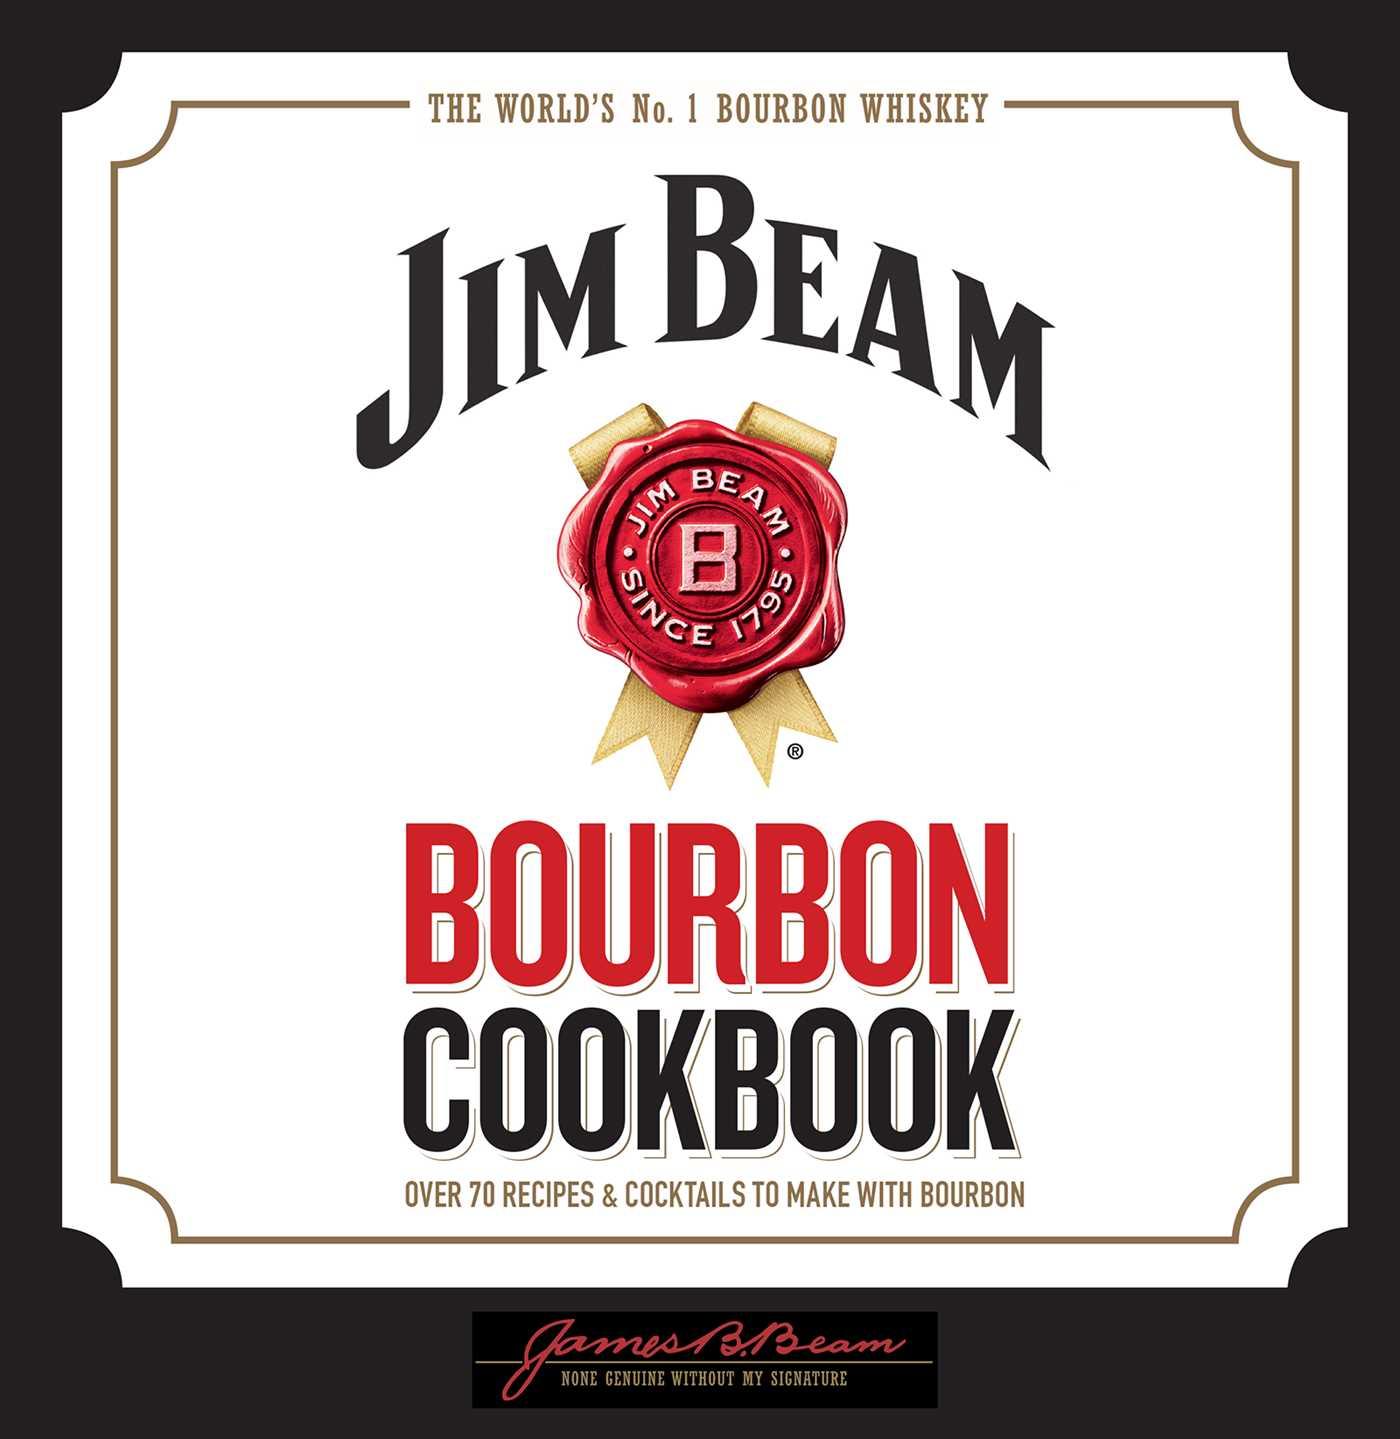 Jim beam bourbon cookbook 9781684123933 hr